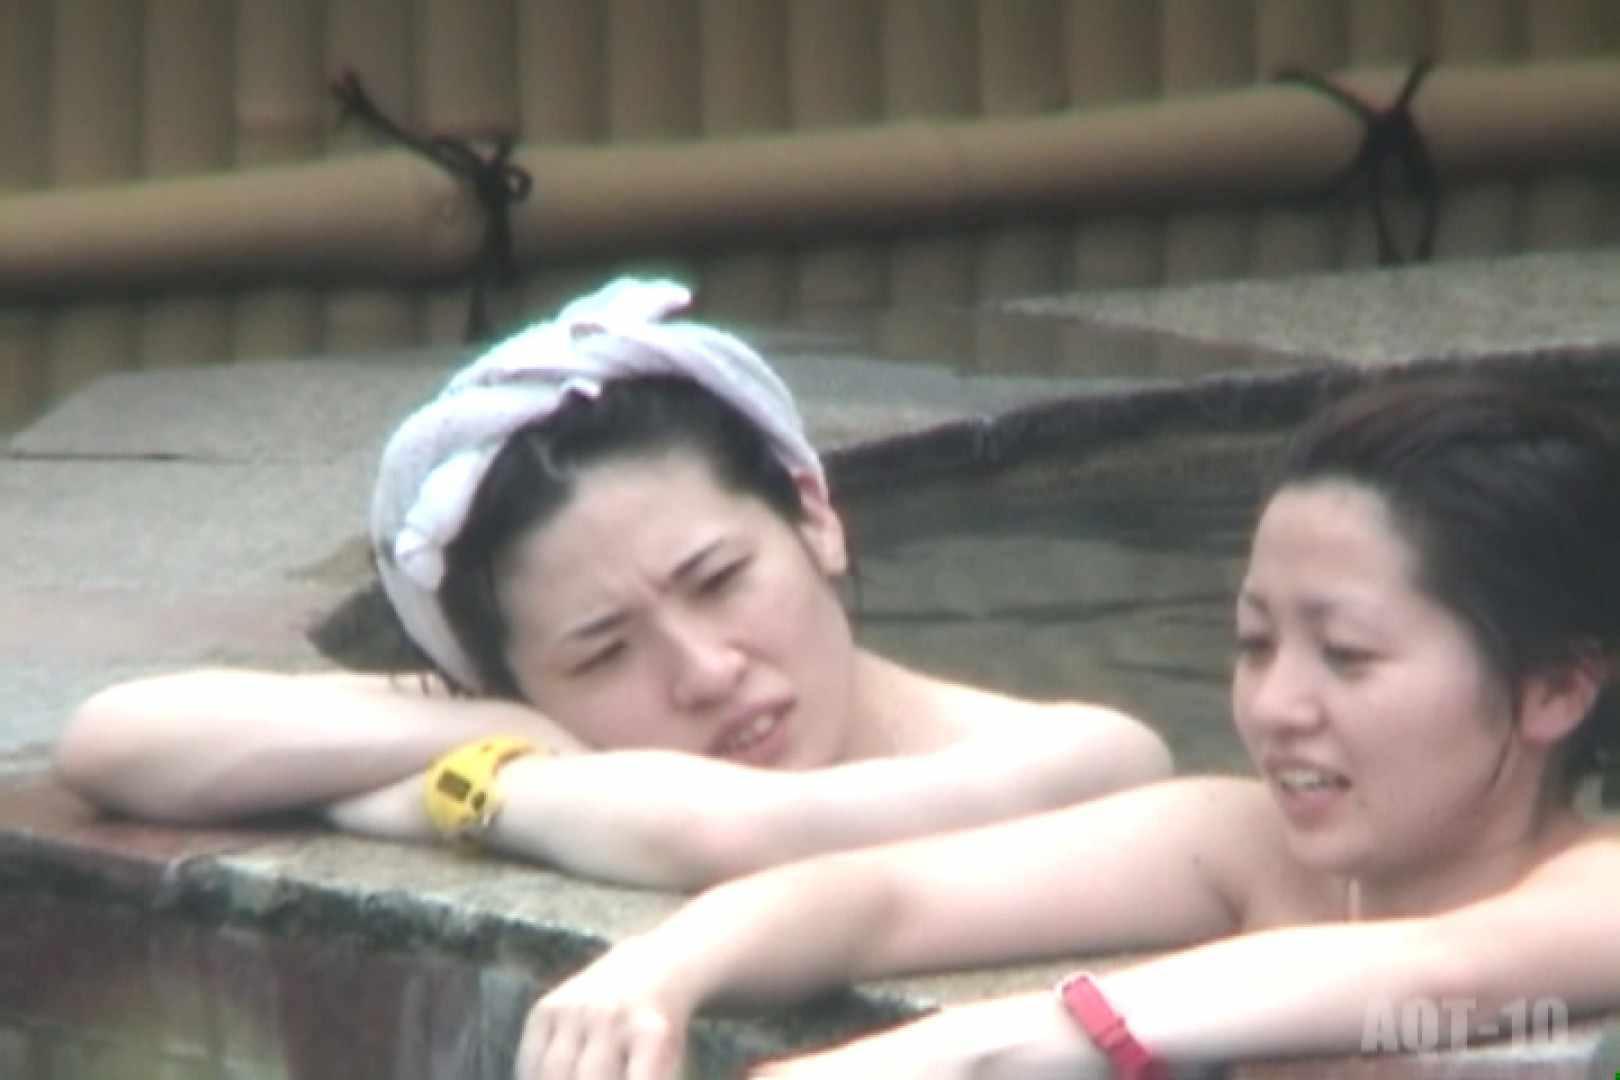 Aquaな露天風呂Vol.793 盗撮映像  72Pix 43